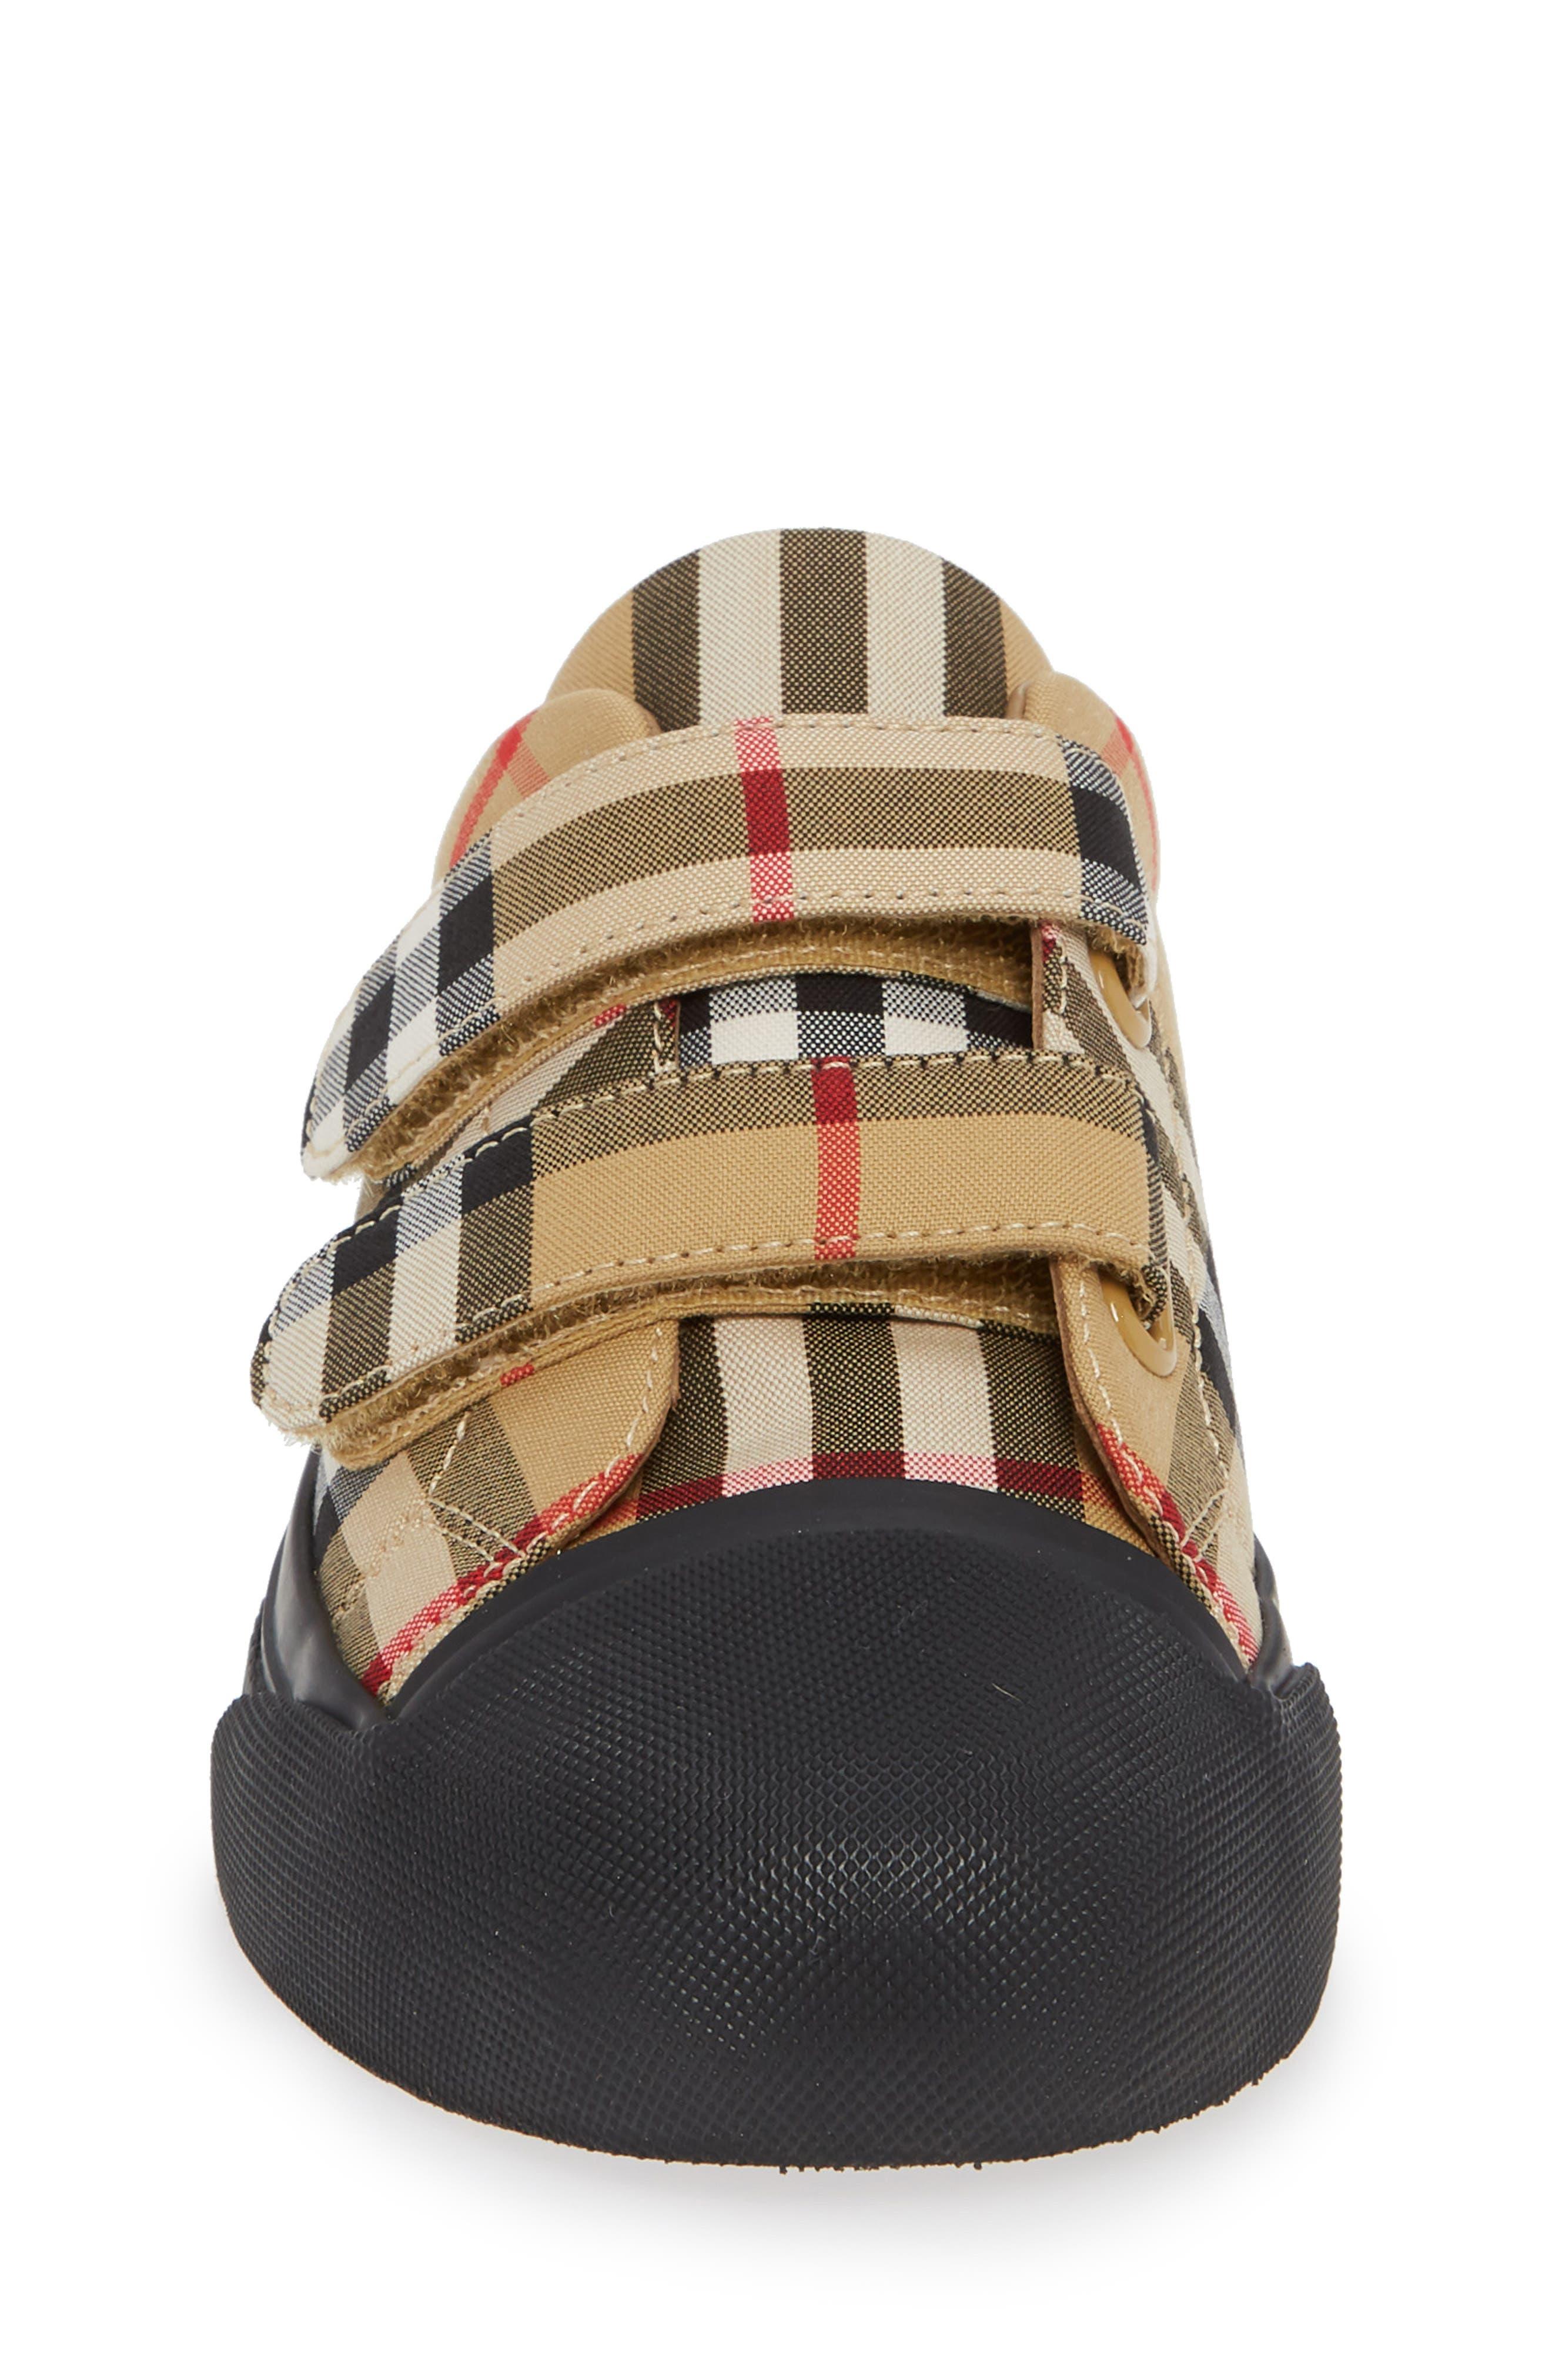 Belside Sneaker,                             Alternate thumbnail 4, color,                             ANTIQUE YELLOW/ BLACK